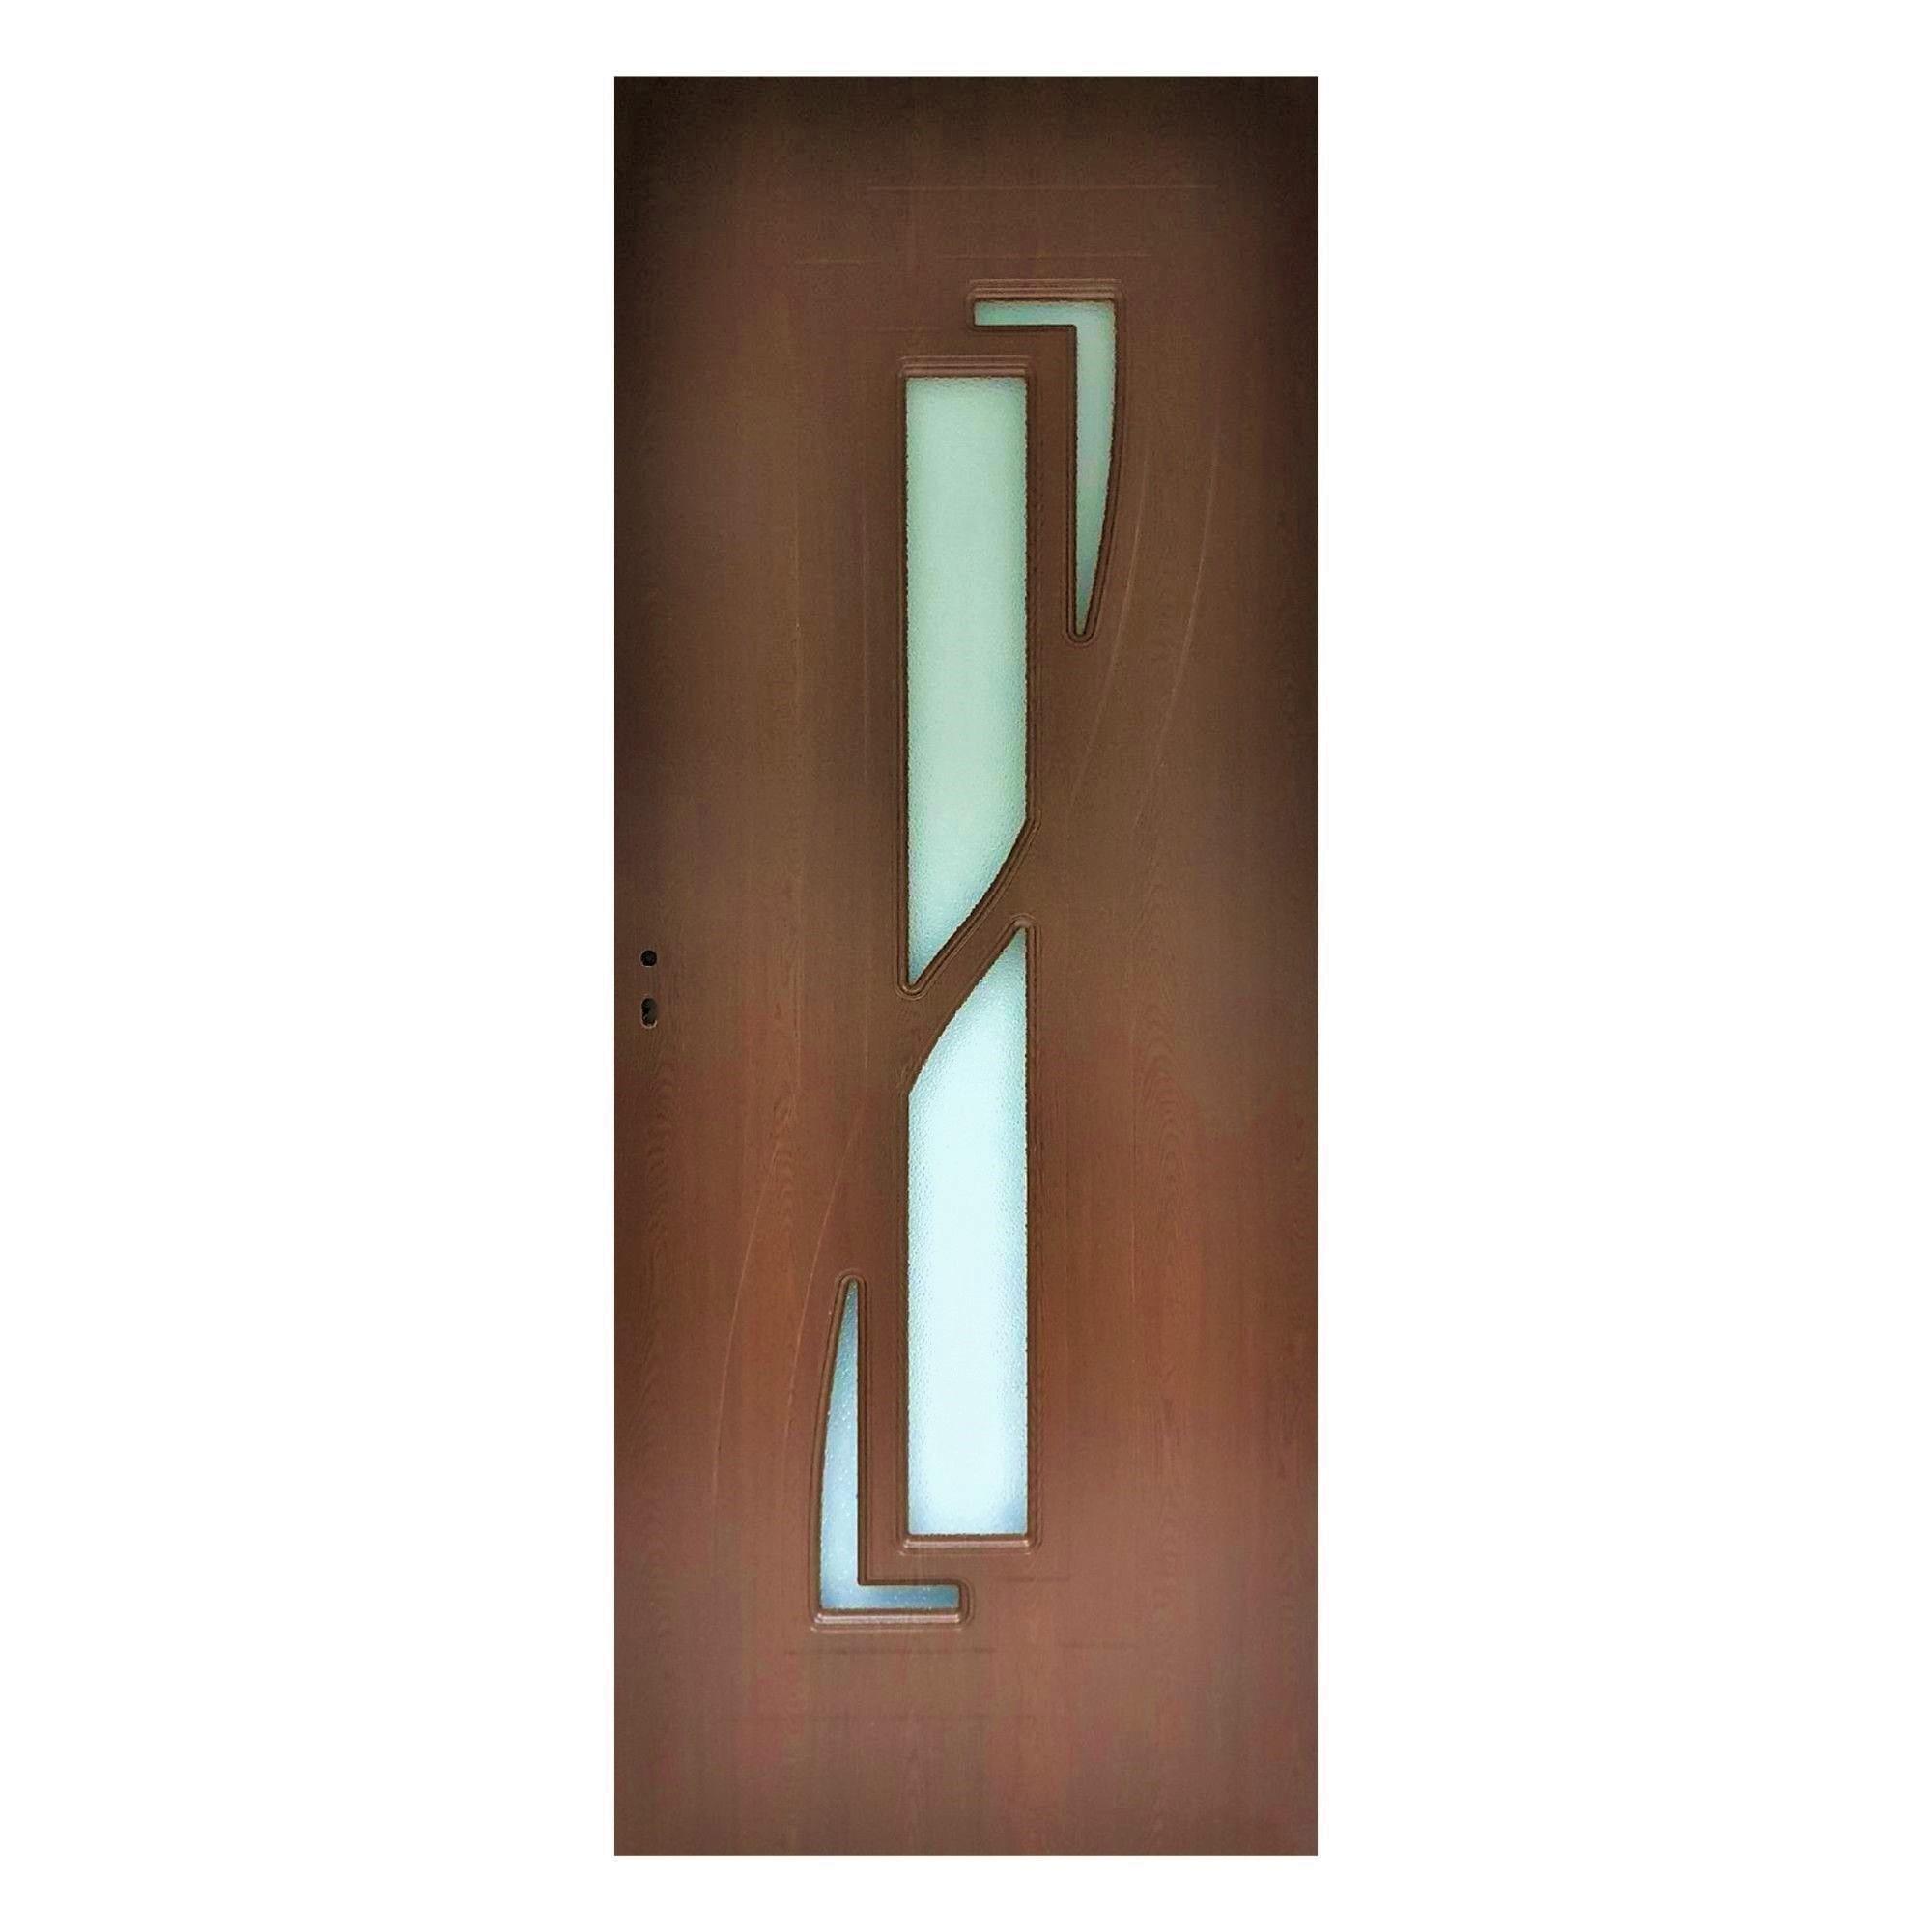 Usa interior cu geam Pamate M042, stejar auriu, 203 x 70 x 3,5 cm + toc reglabil, reversibila